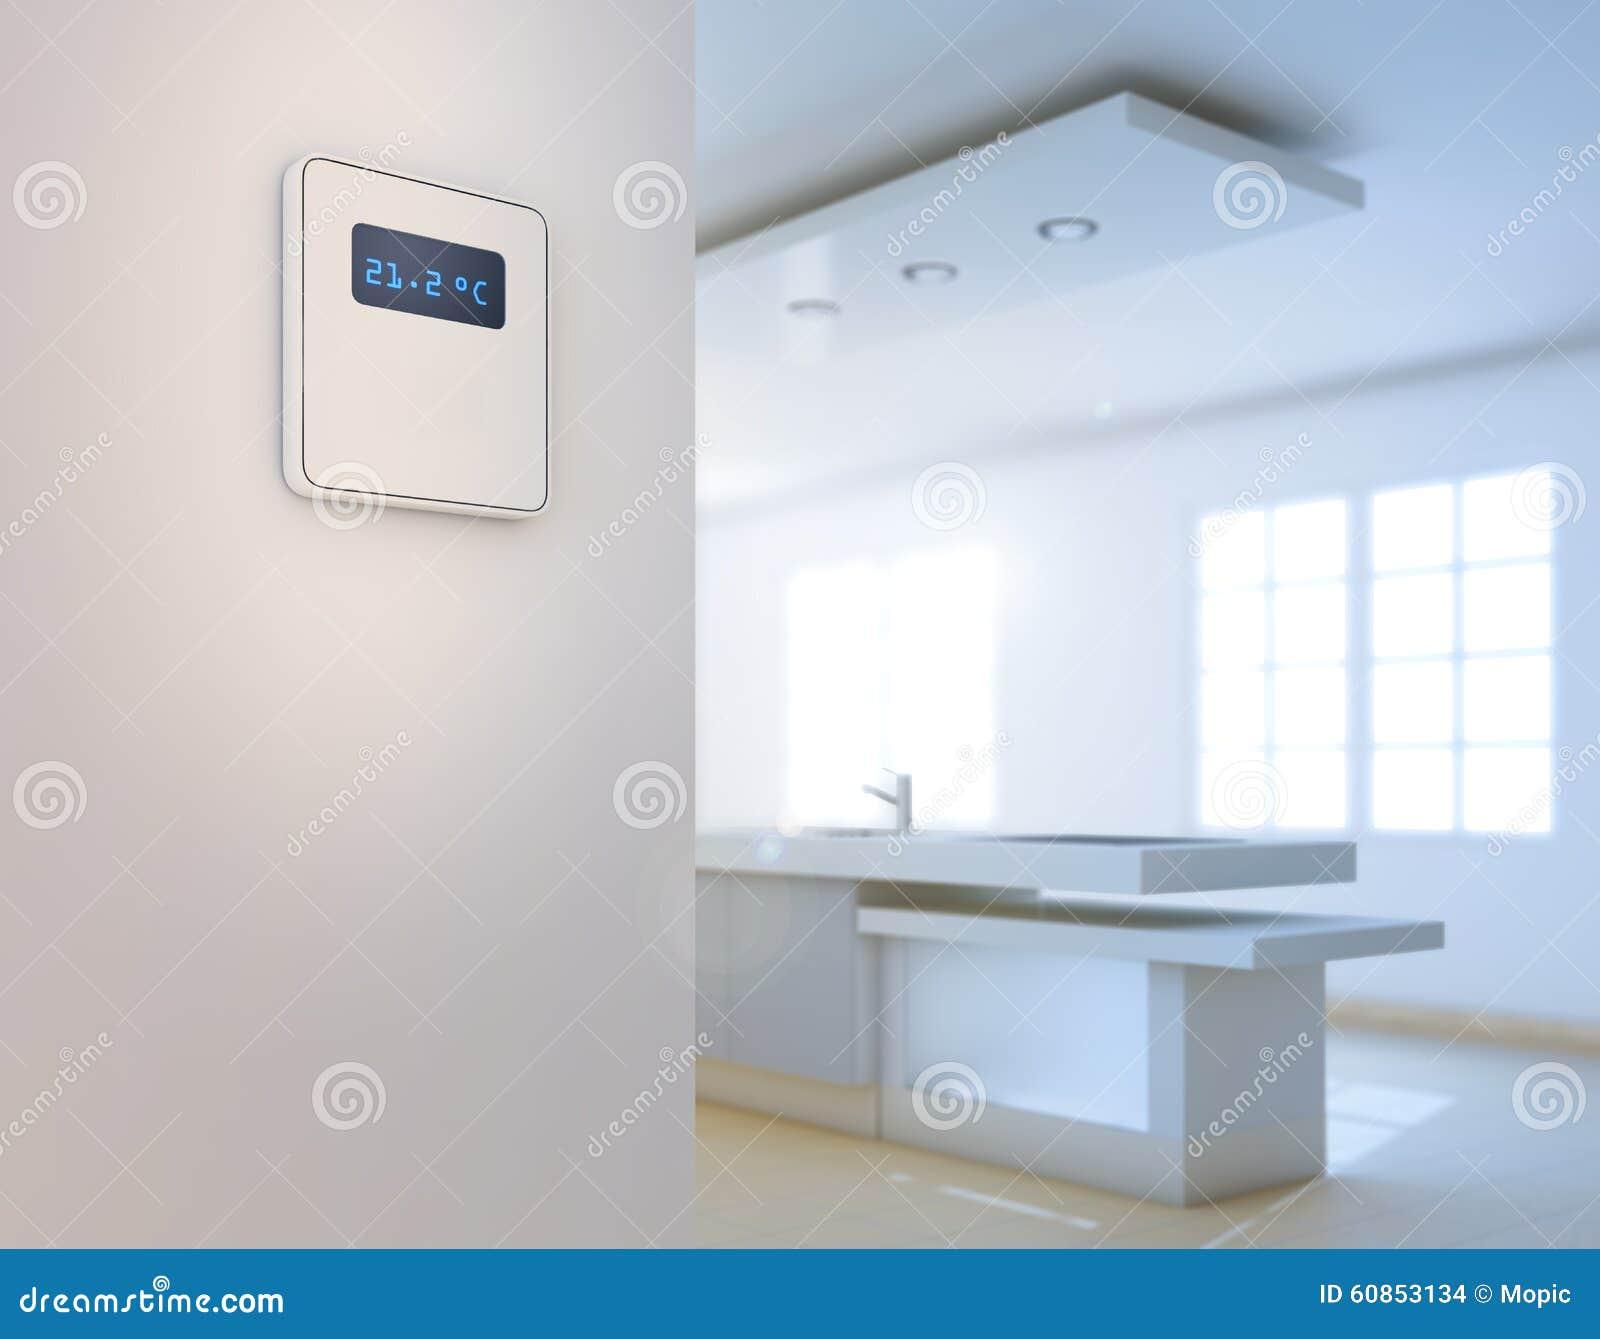 Home Automation Background Stock Photo Image 60853134